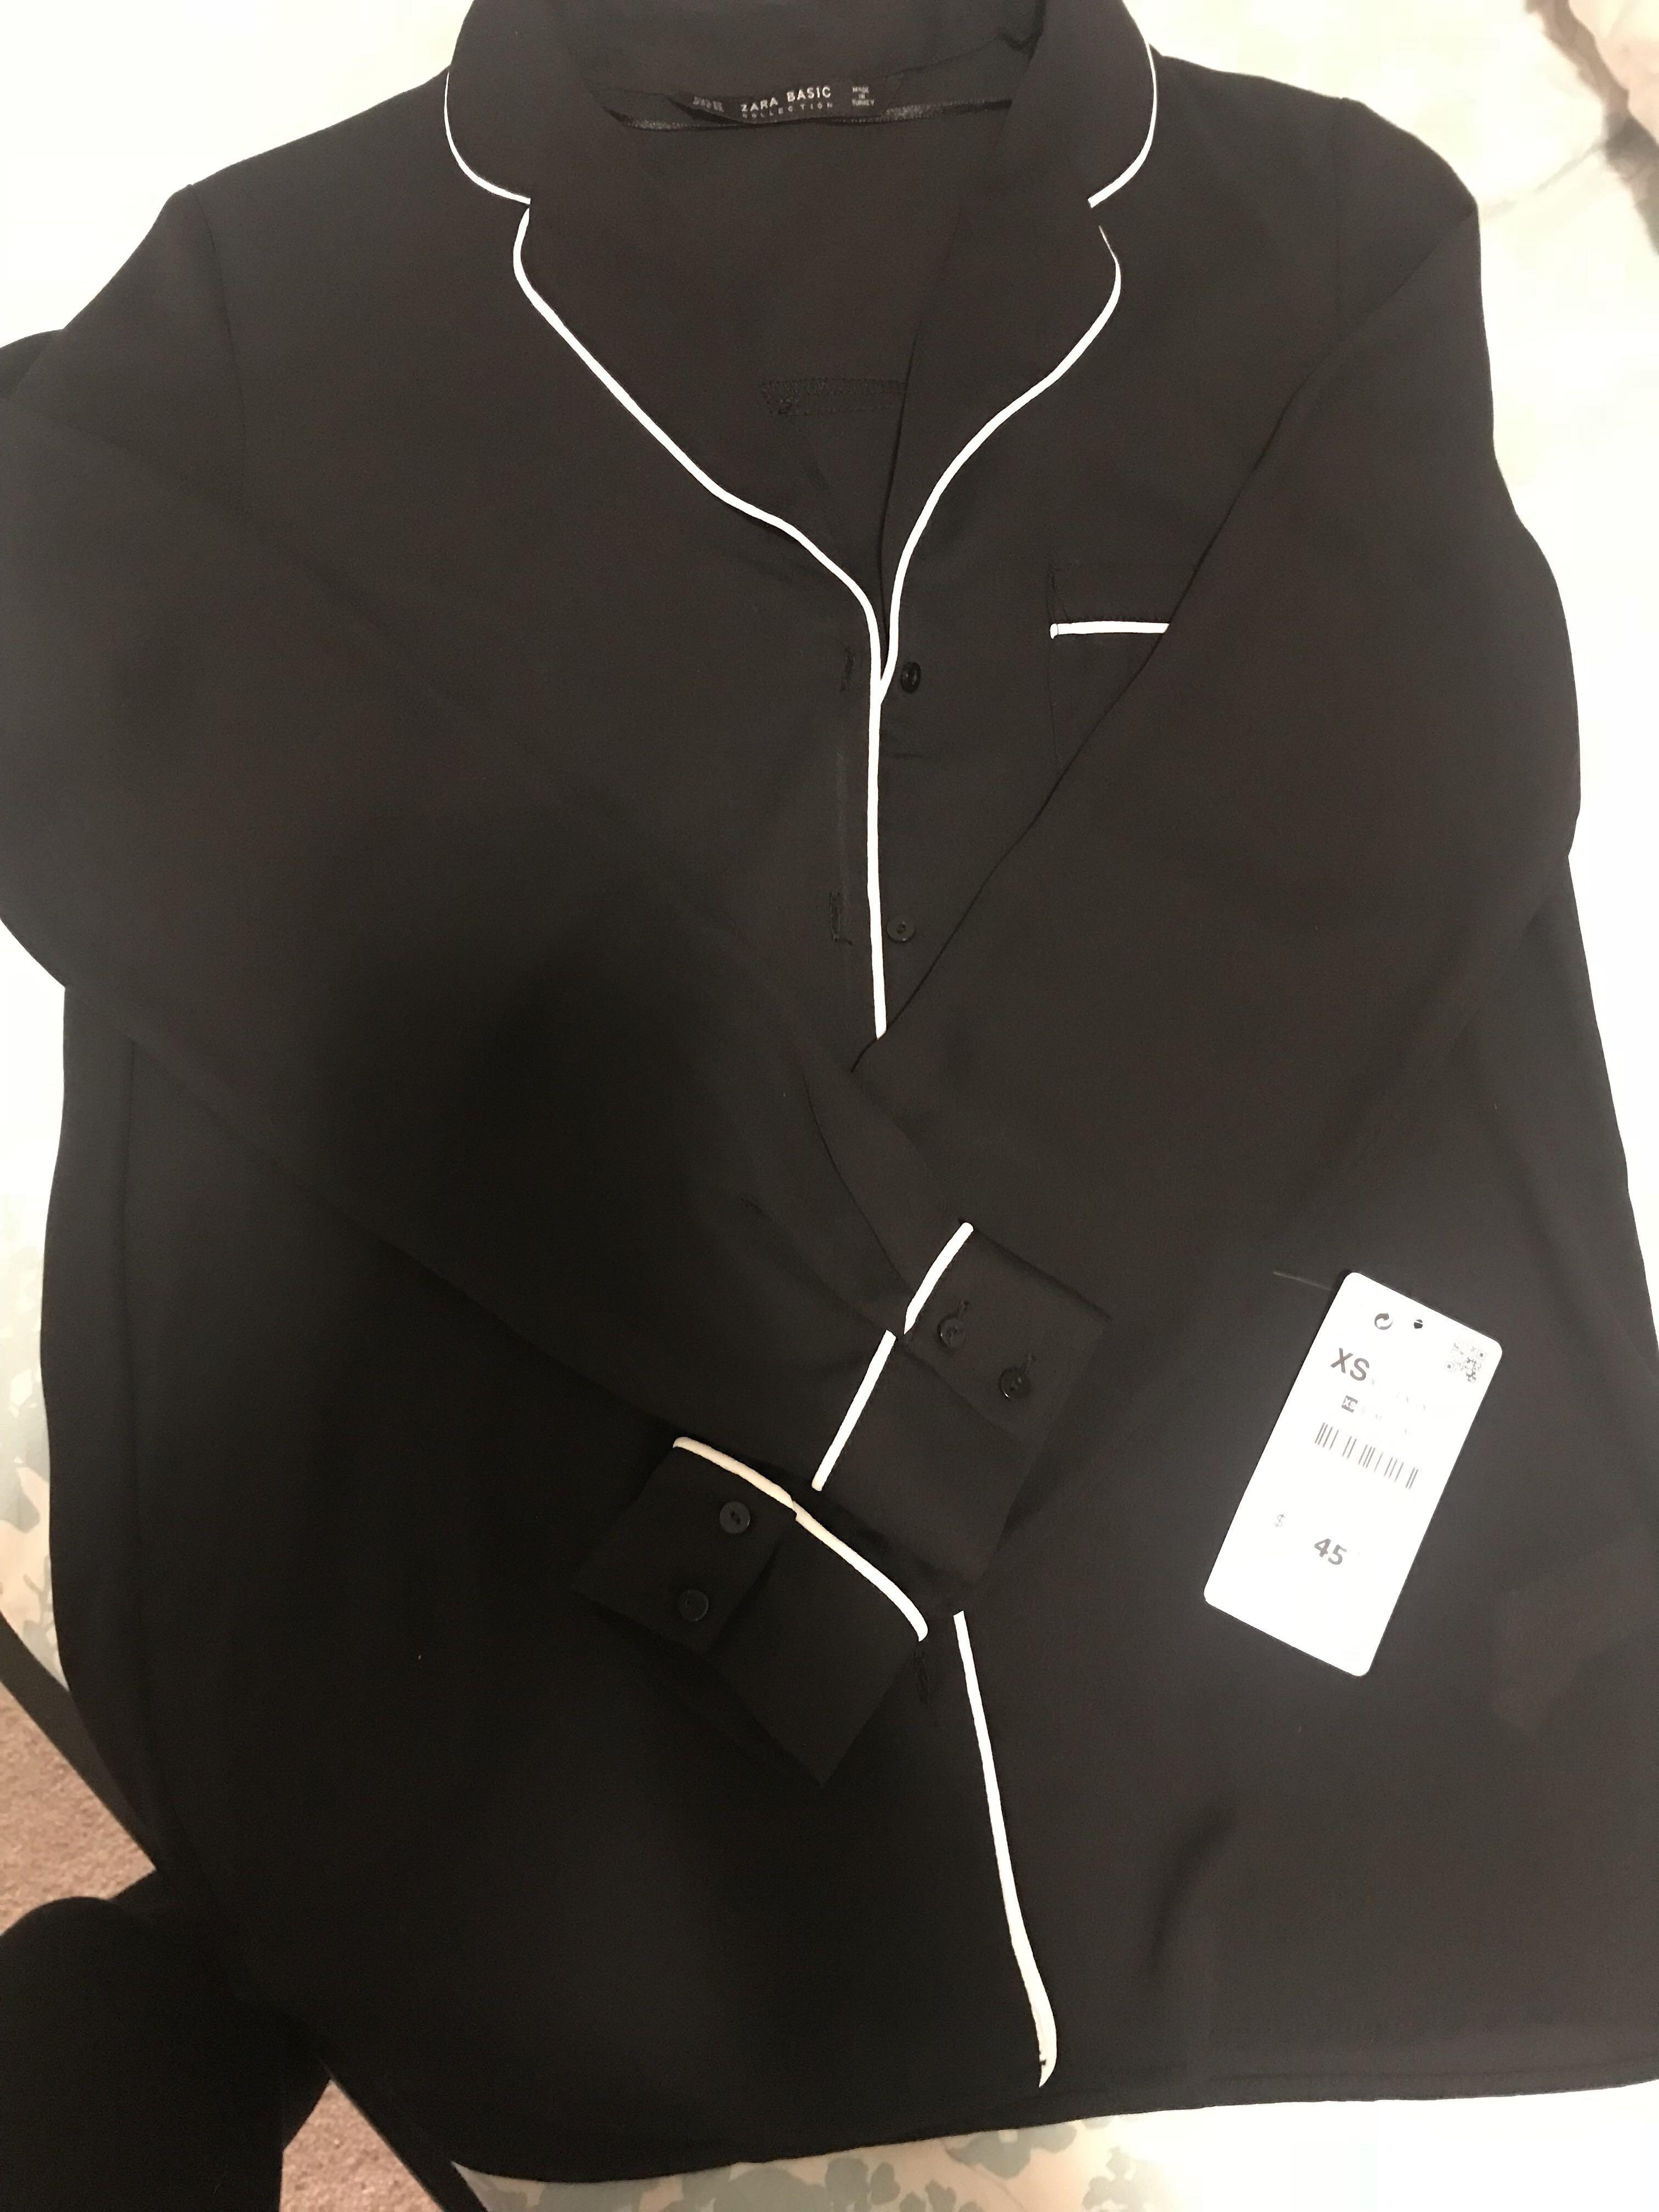 Zara Basic Top XS